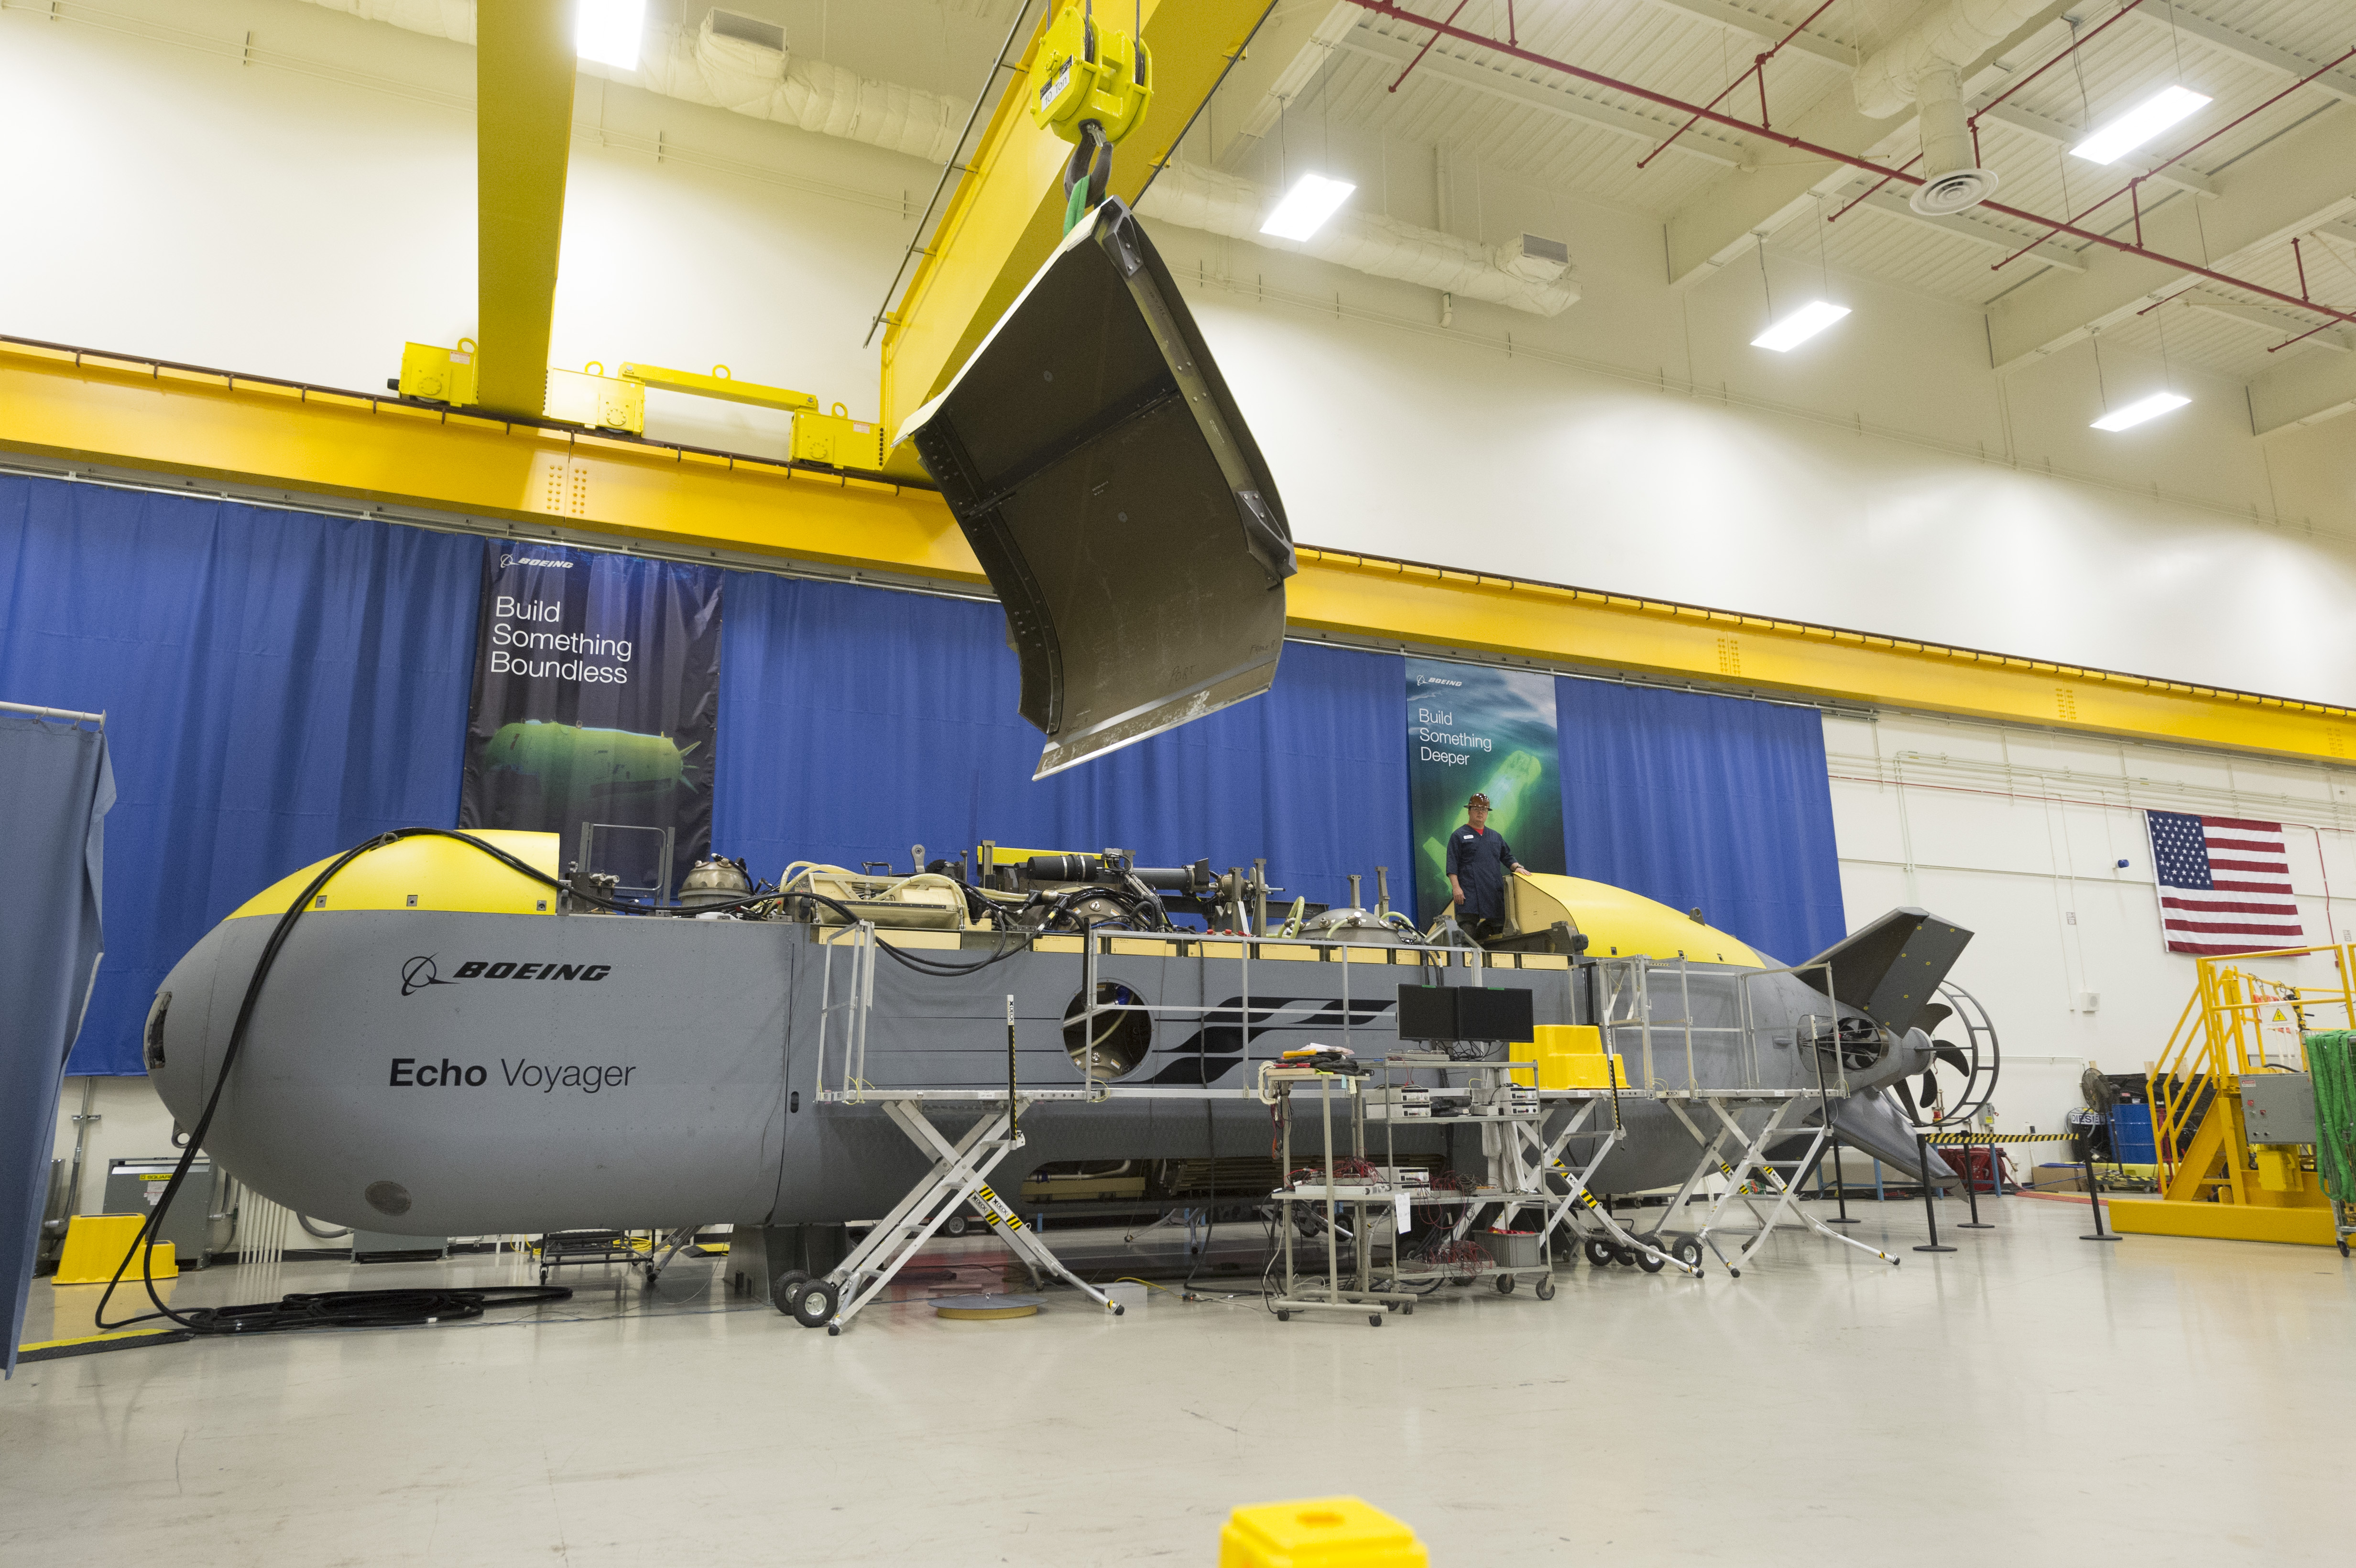 Drone warfare heads under the seas as U.S. seeks advantage over rivals